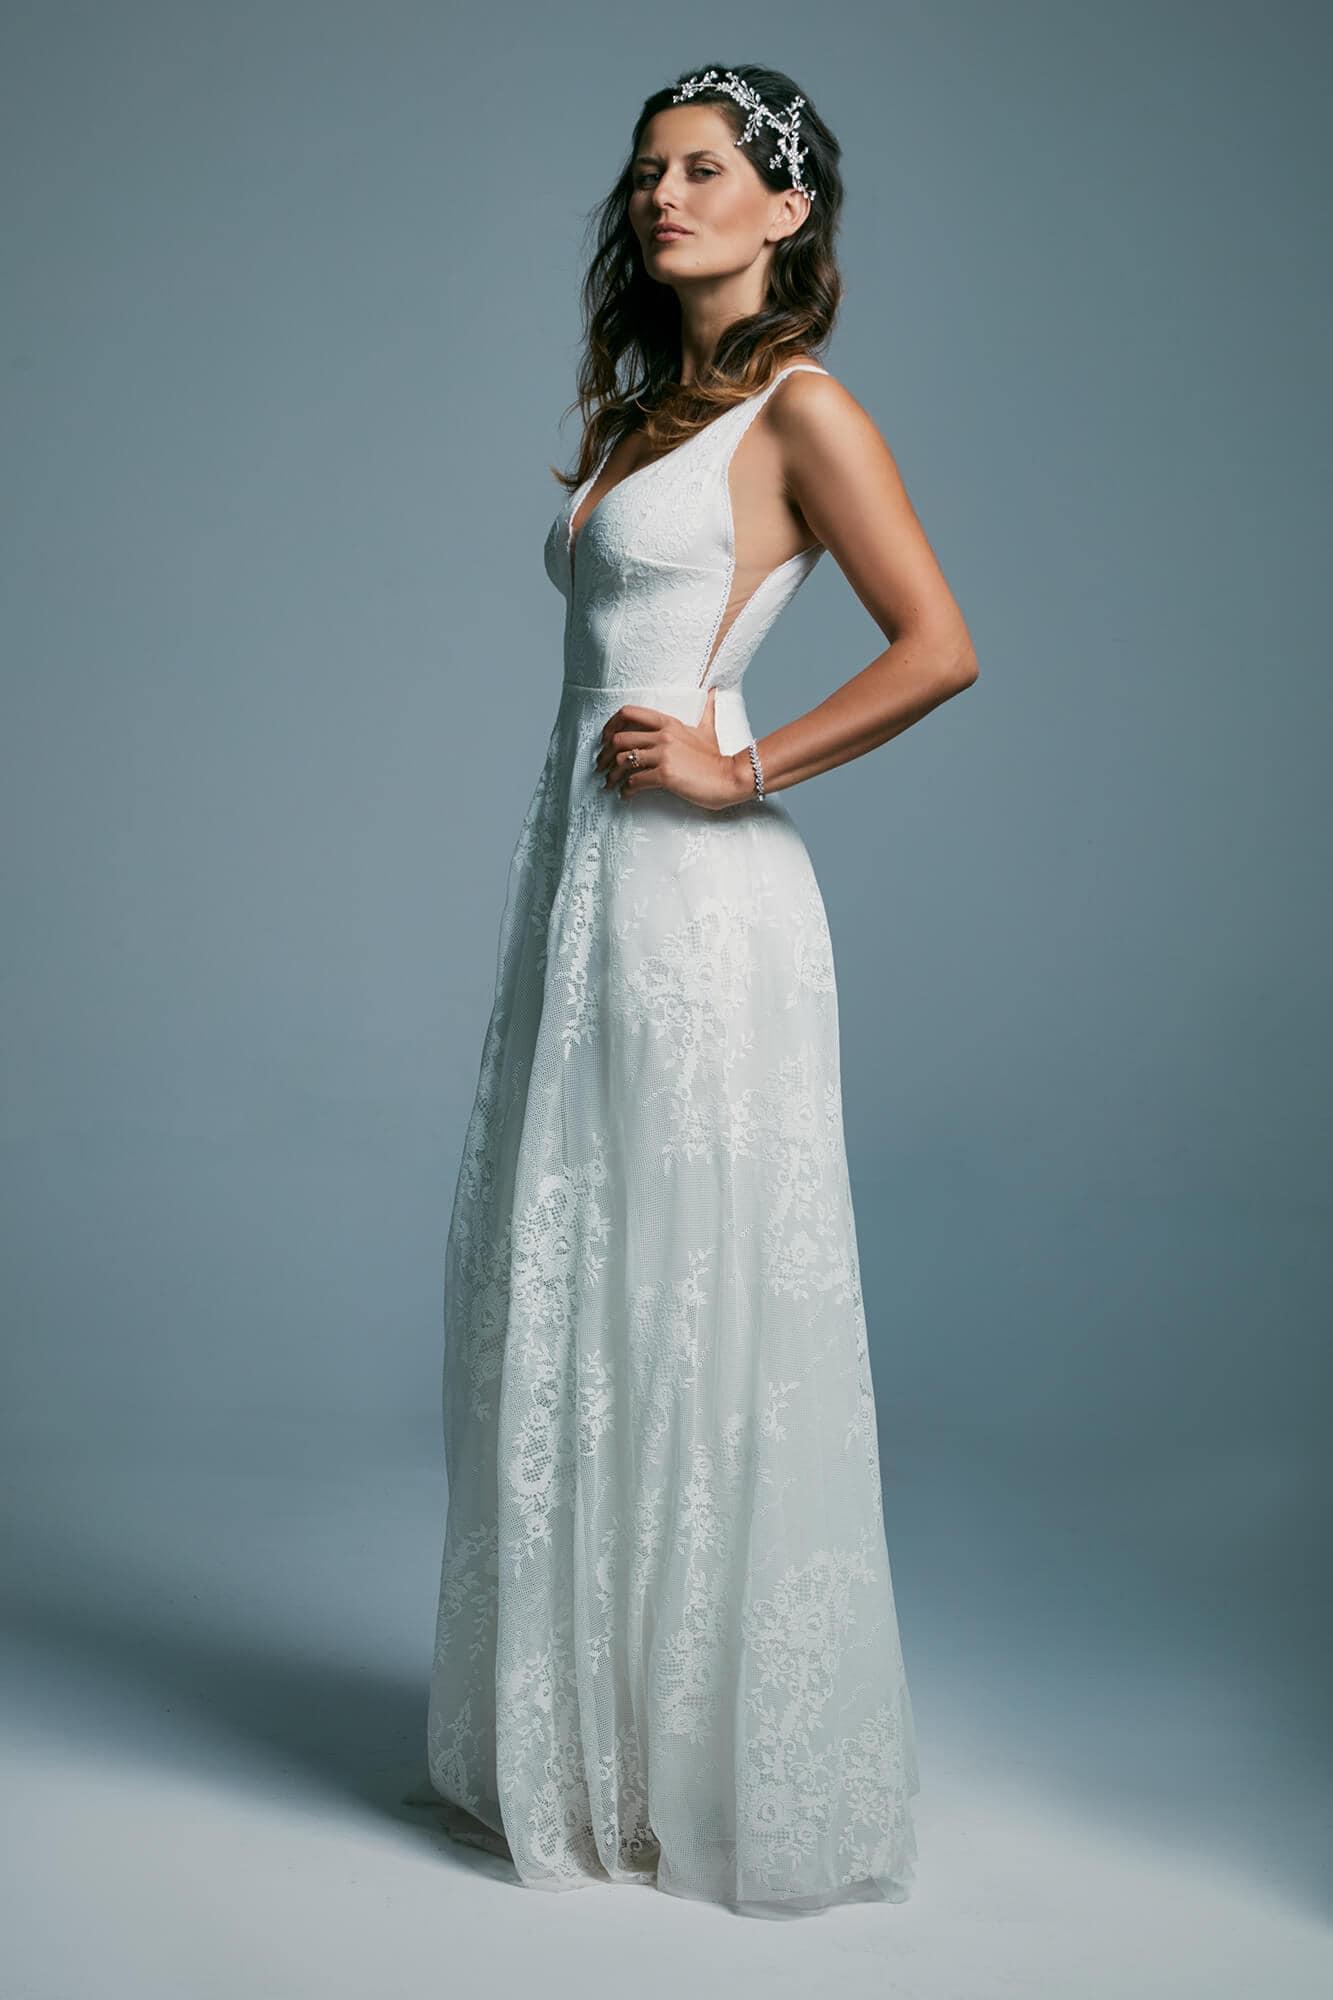 A white wedding dress with a beautiful deep neckline Porto 34